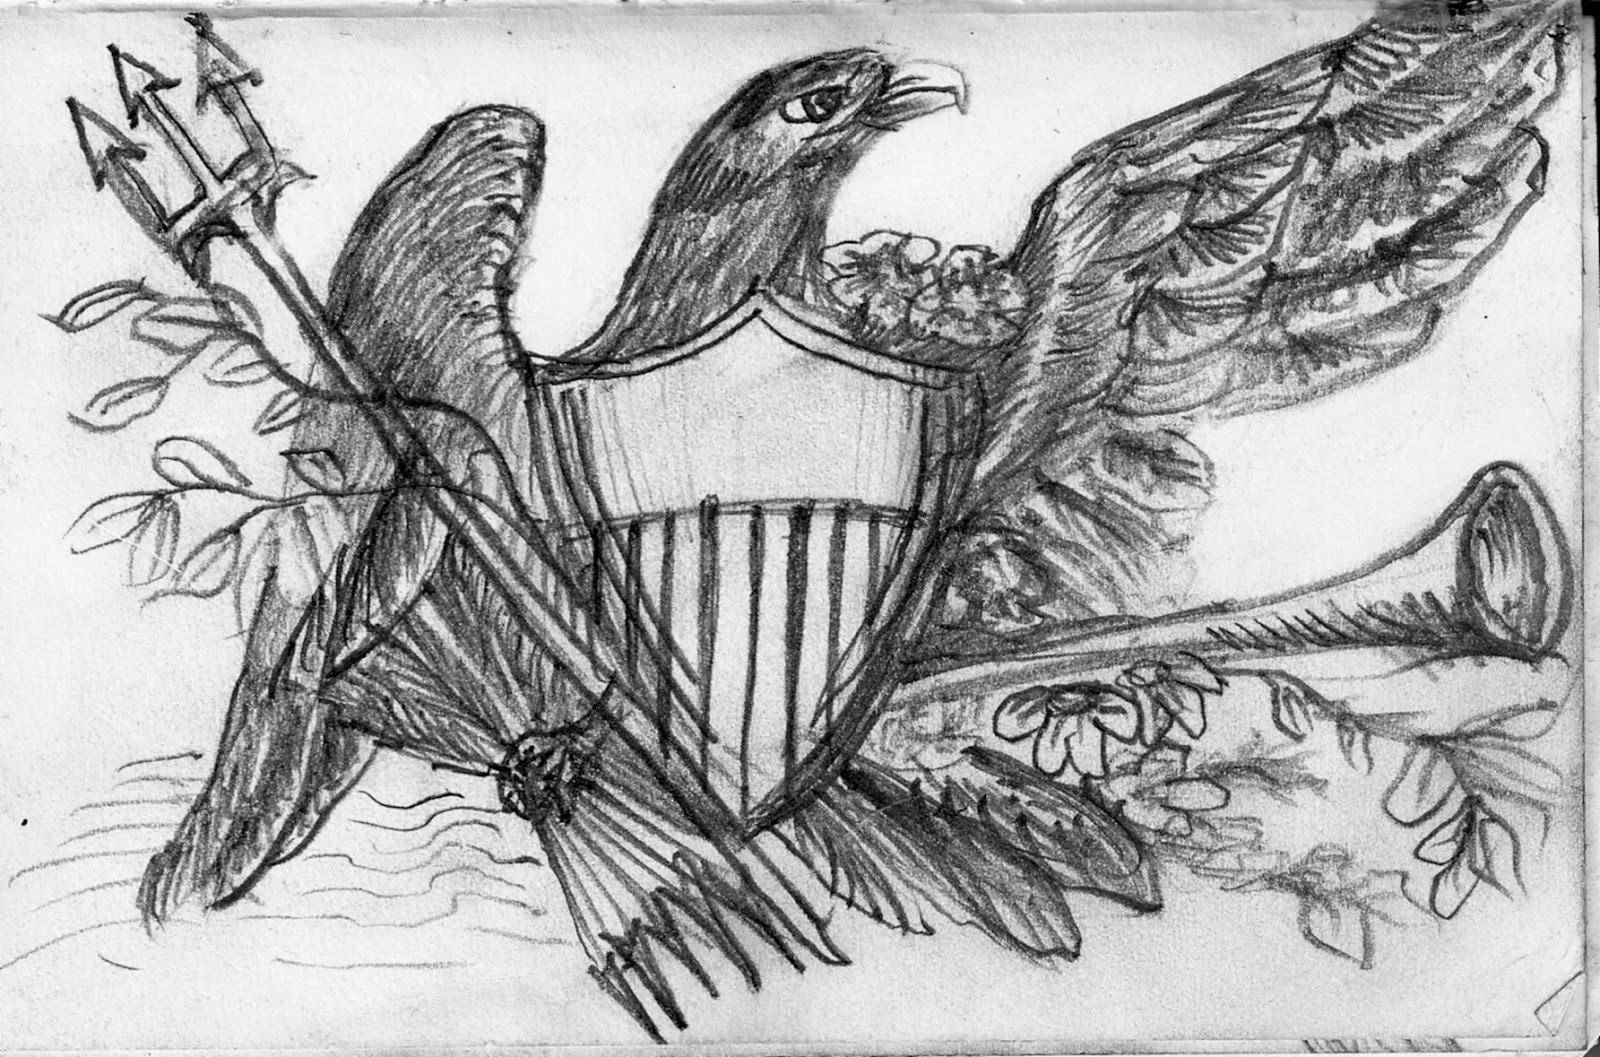 The Company 'Q' Dispatches: More Civil War Sketchin' Time